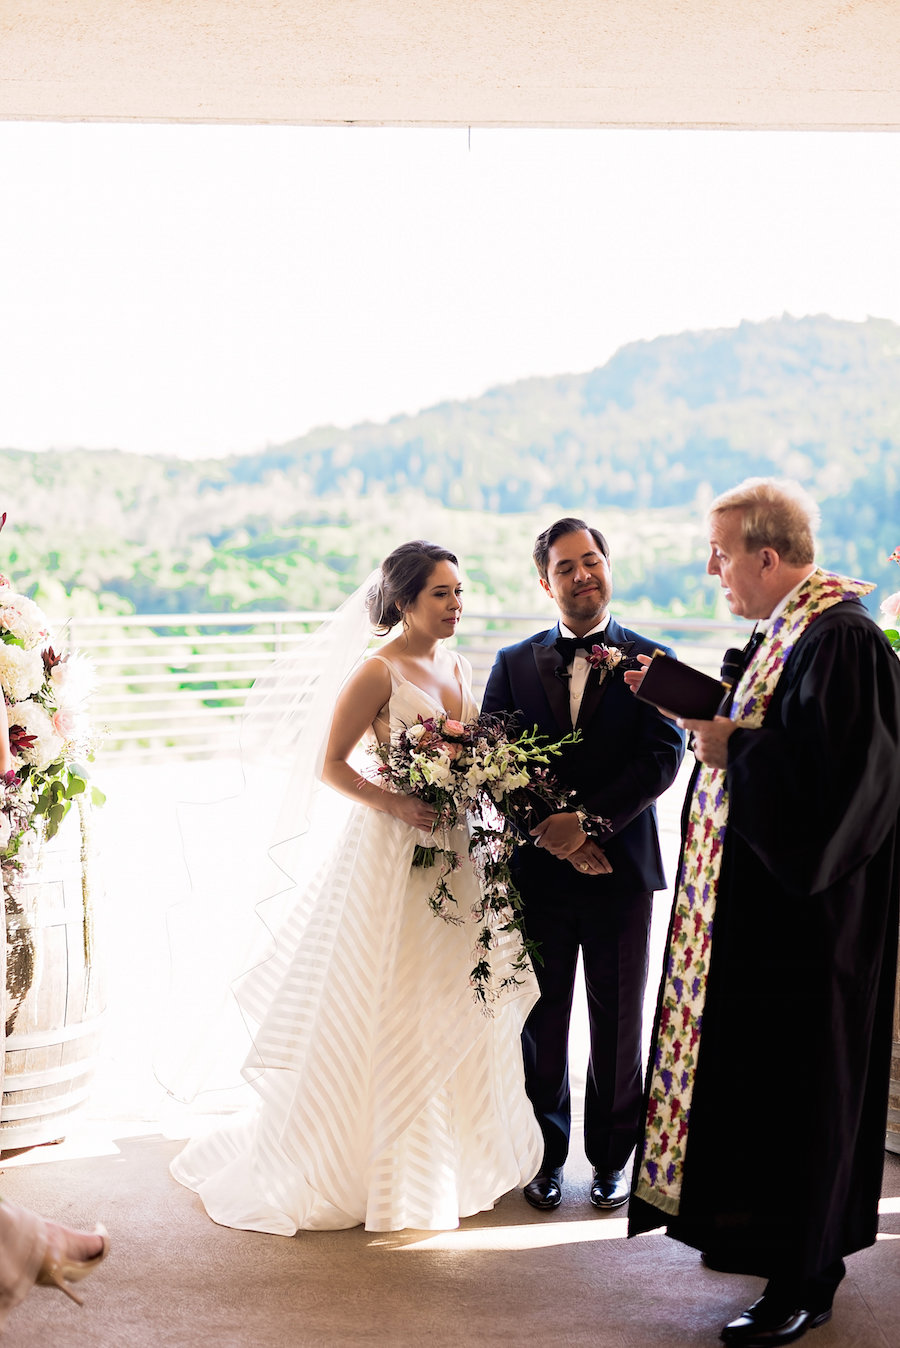 Rachel-Sergio-Wedding-Pharris-Photos-0076.jpg